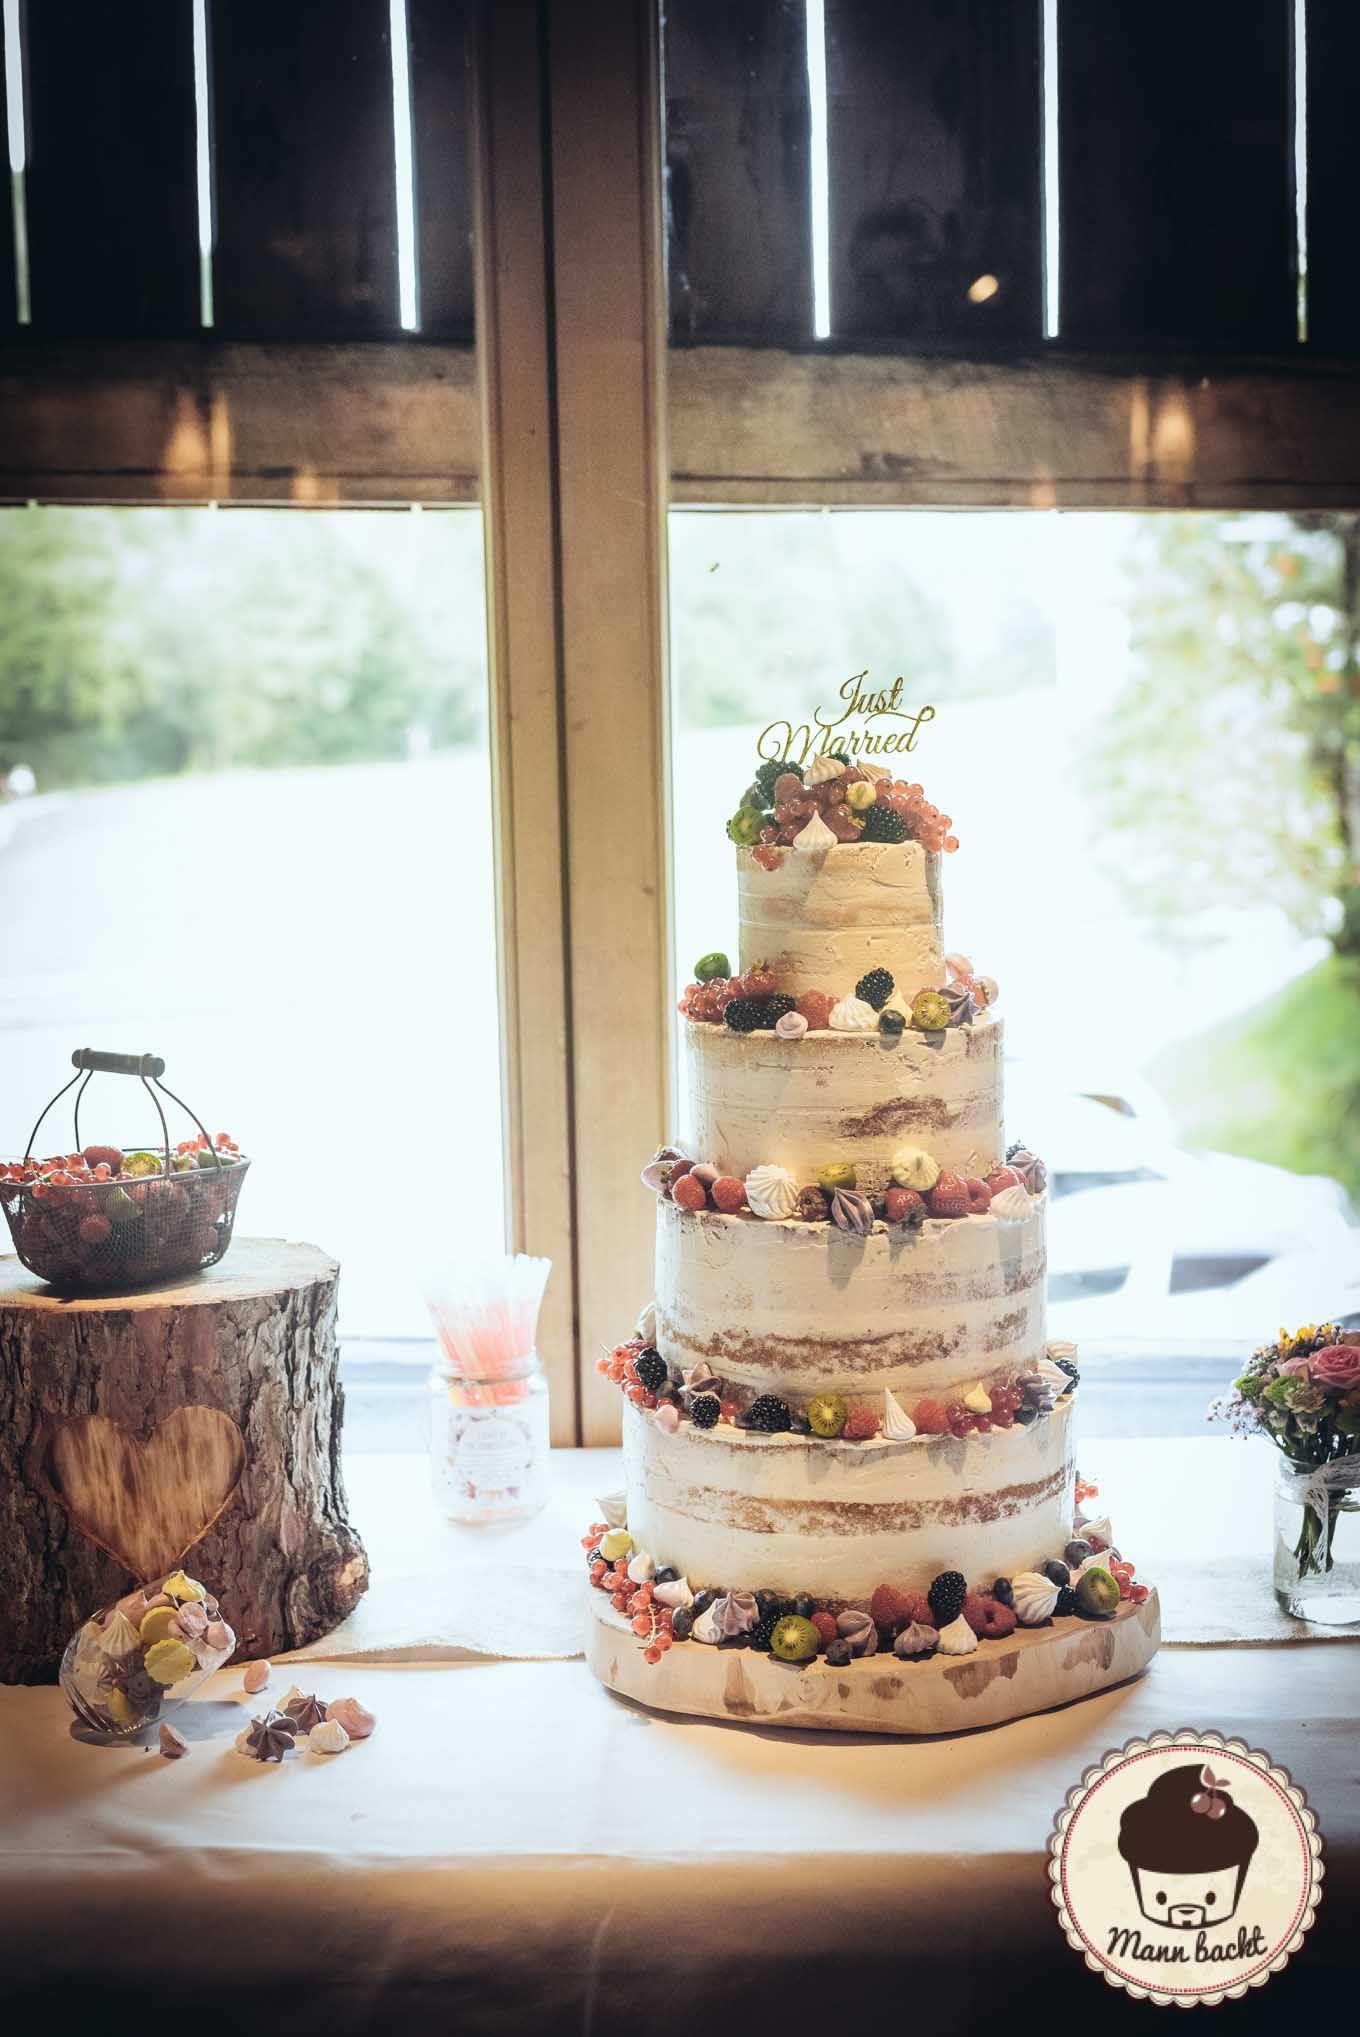 Naked Cake Hochzeitstorte  [Tutorial] Der perfekte Naked Cake